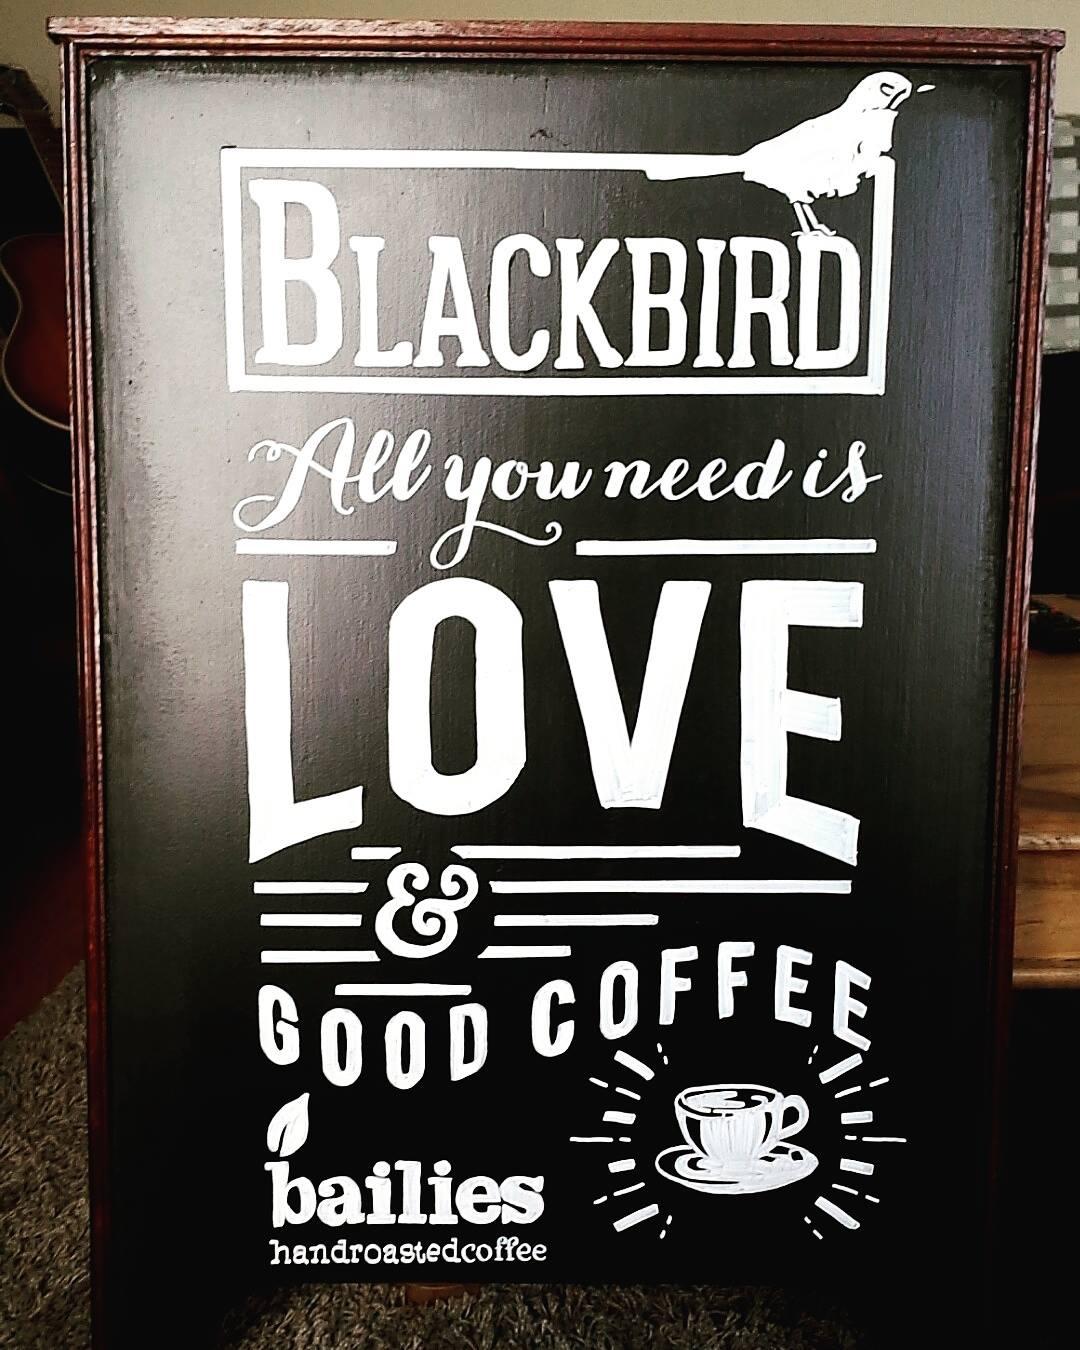 Blackbird, Derry